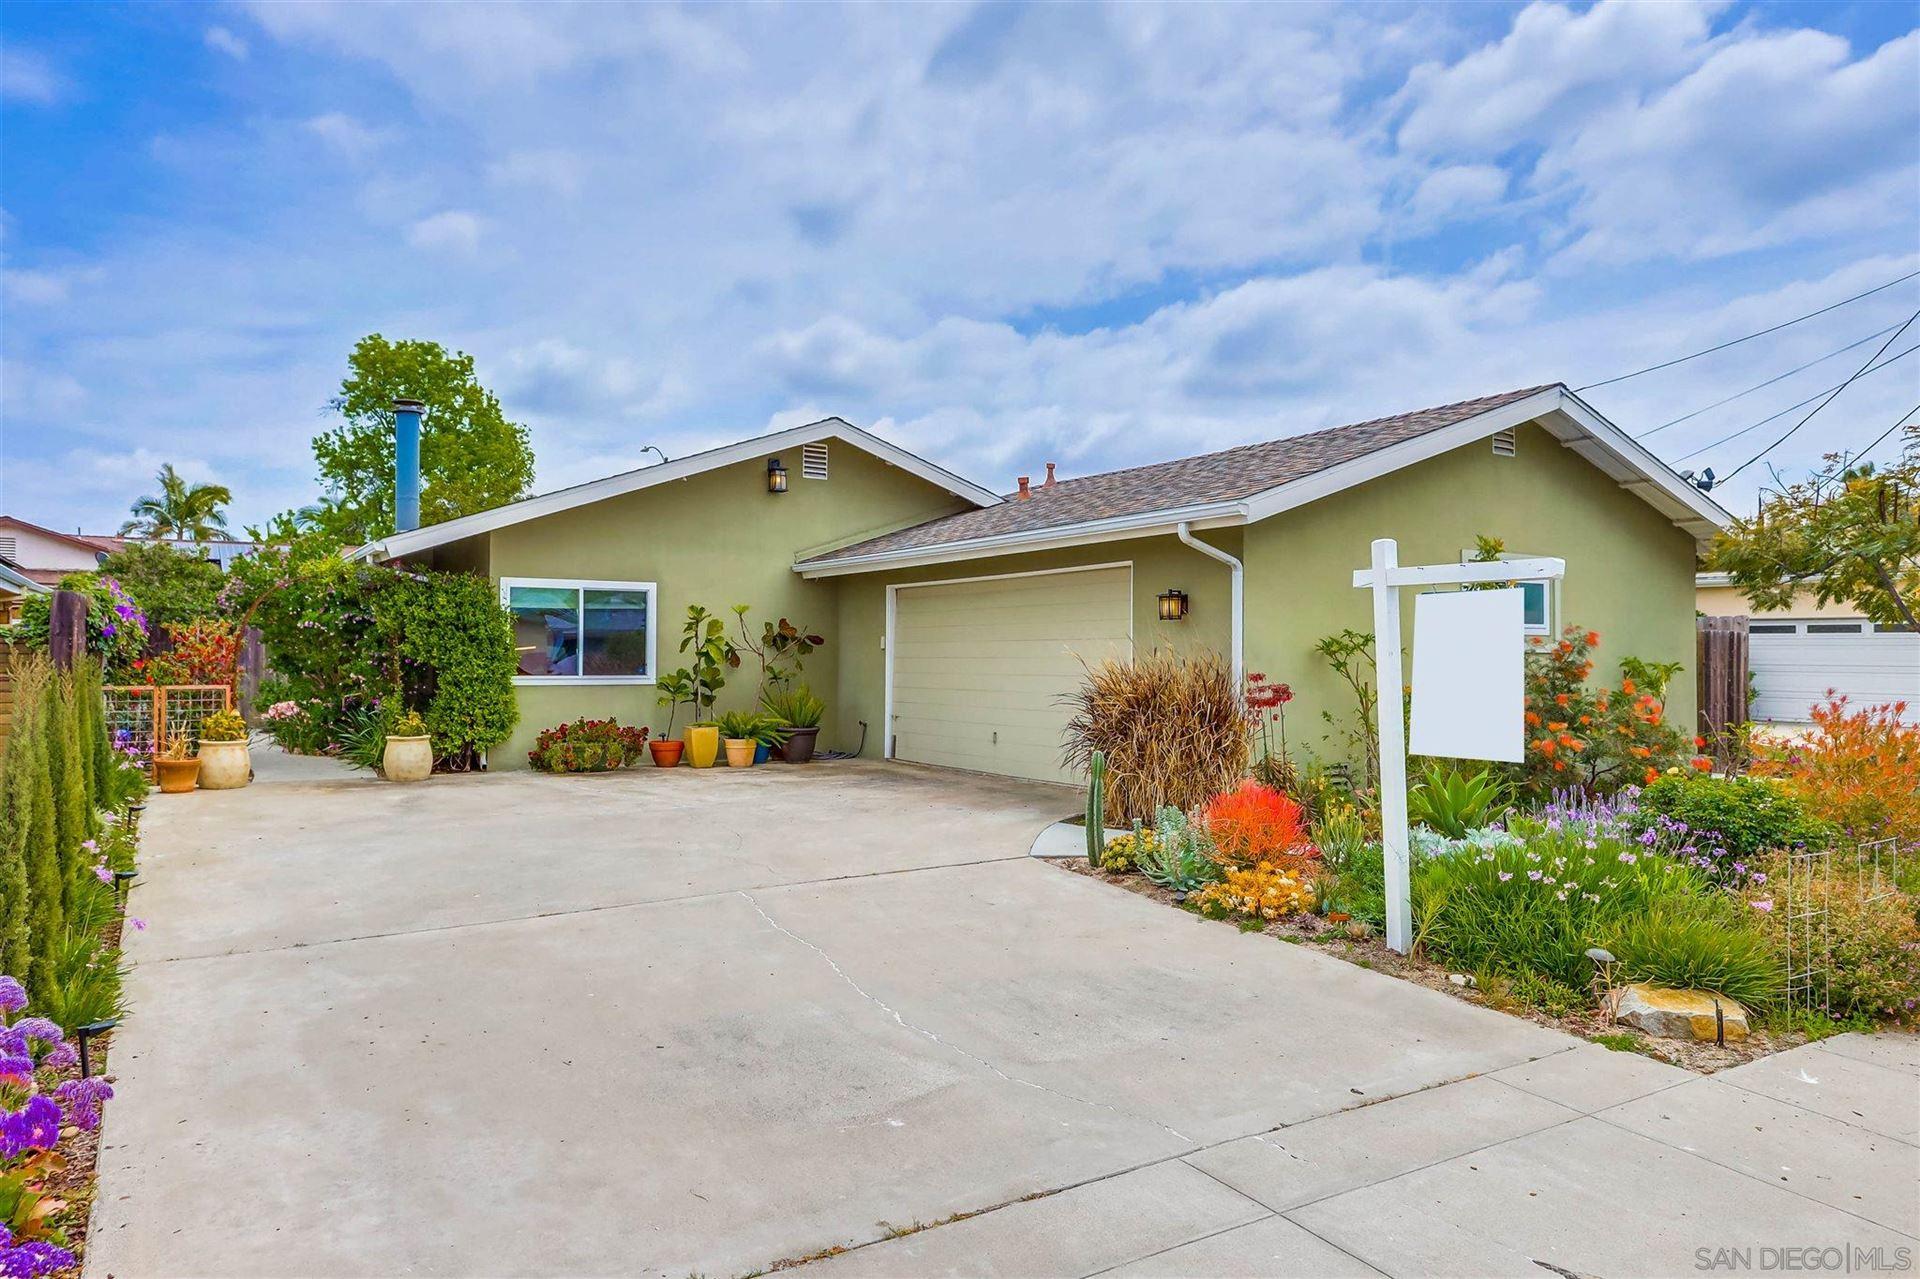 Photo of 4725 Normandie Pl, La Mesa, CA 91942 (MLS # 210008874)